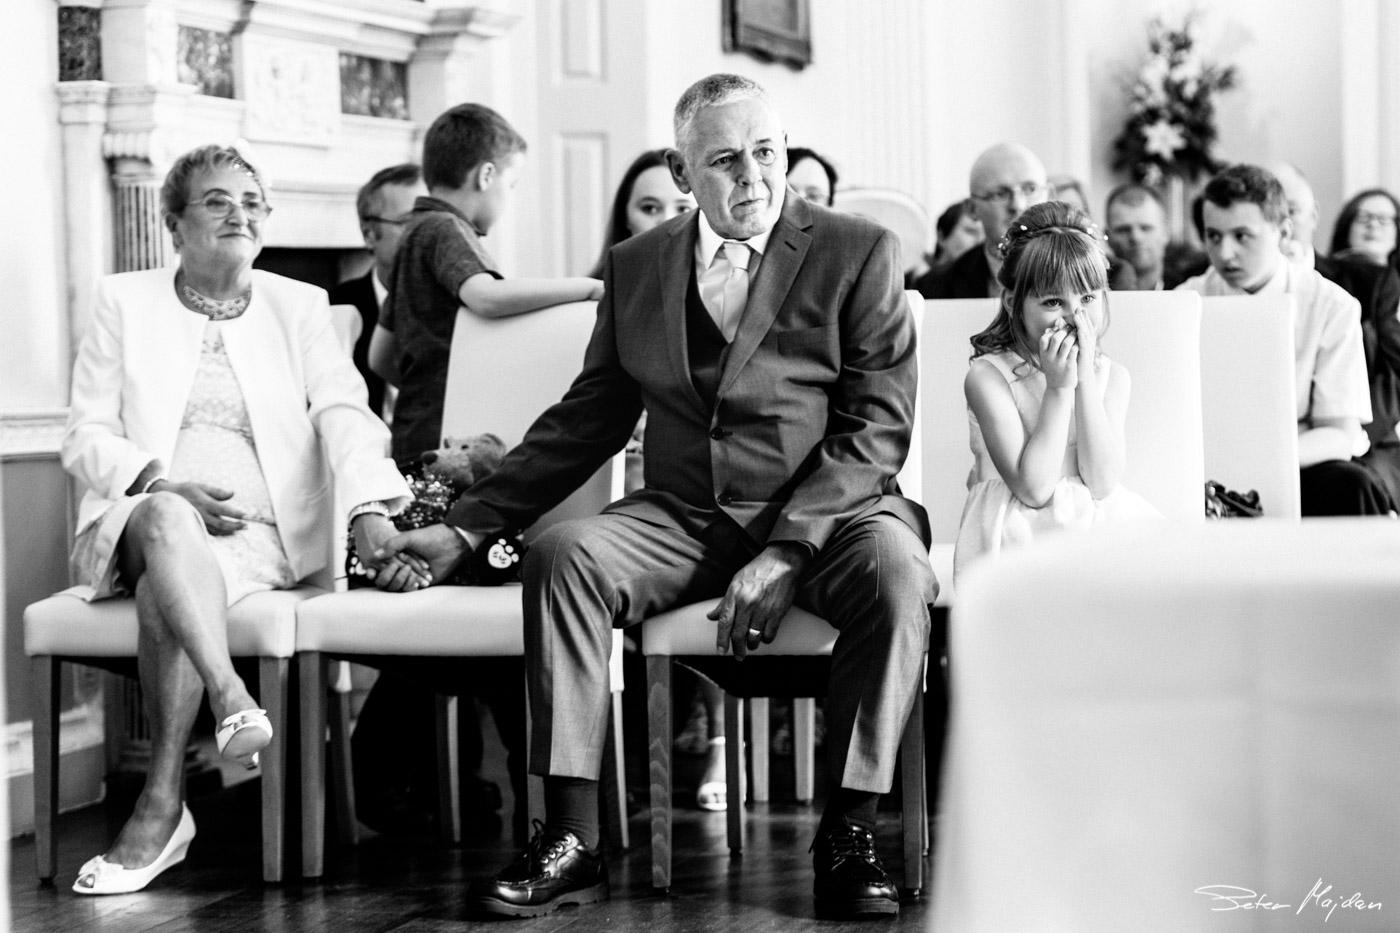 Colwick-hall-wedding-photography-21.jpg